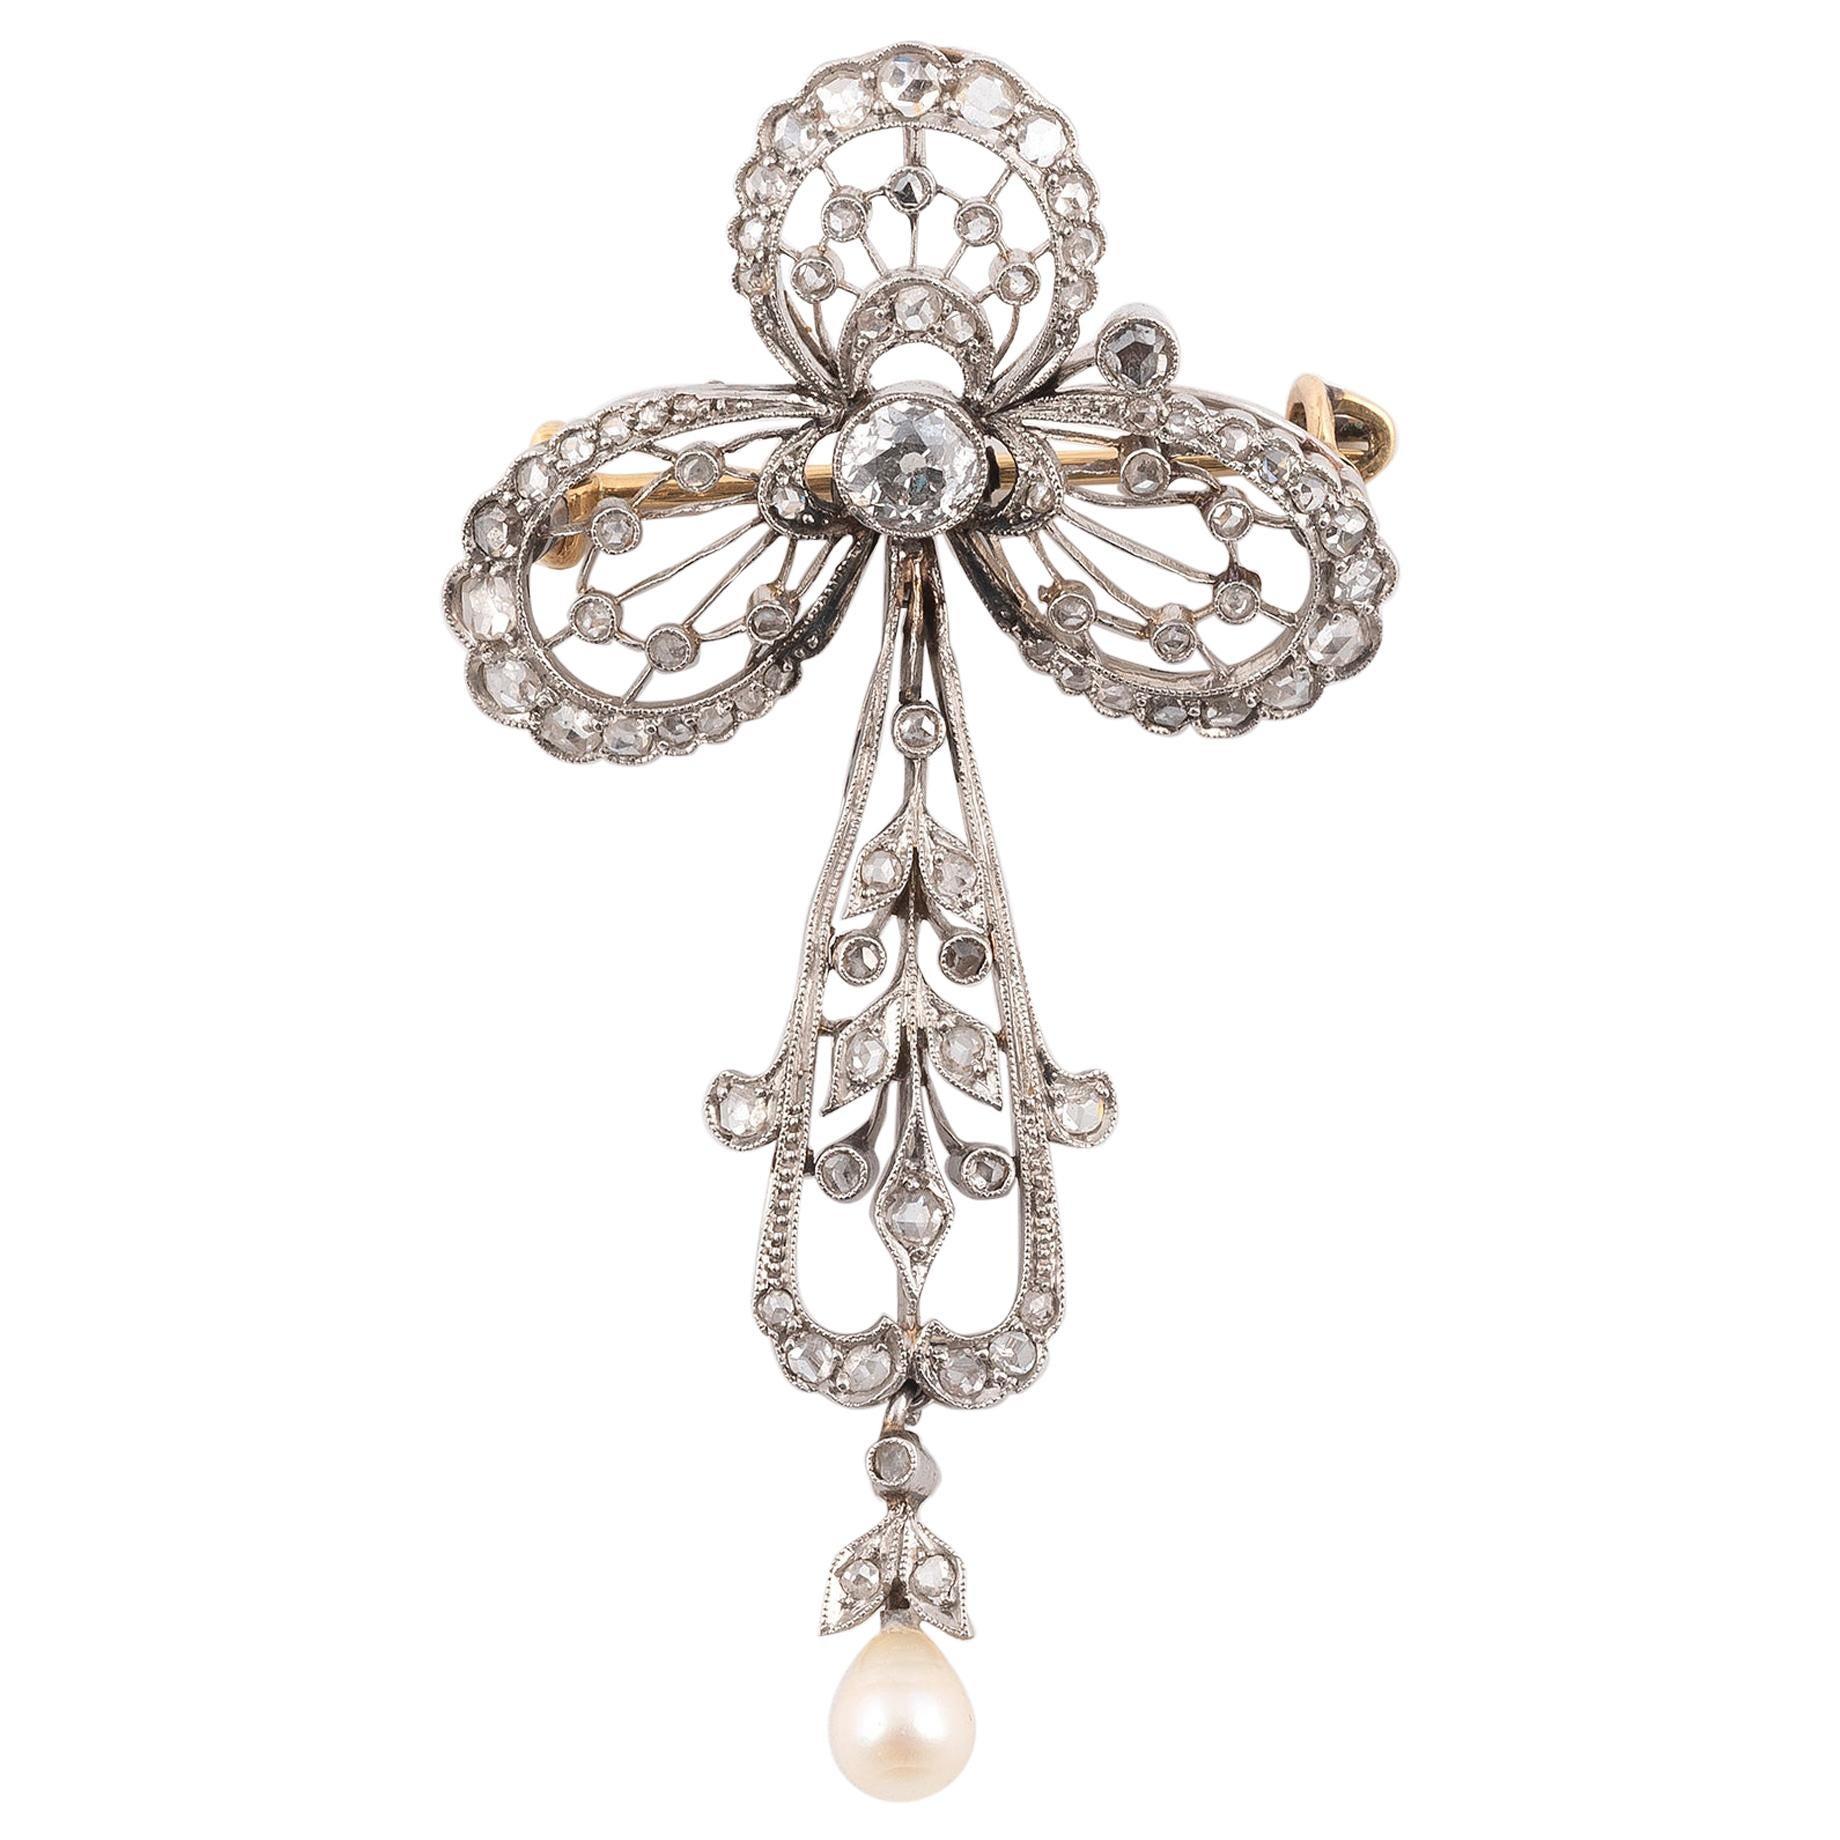 Art Deco' Platinum and Diamond Brooch or Pendant